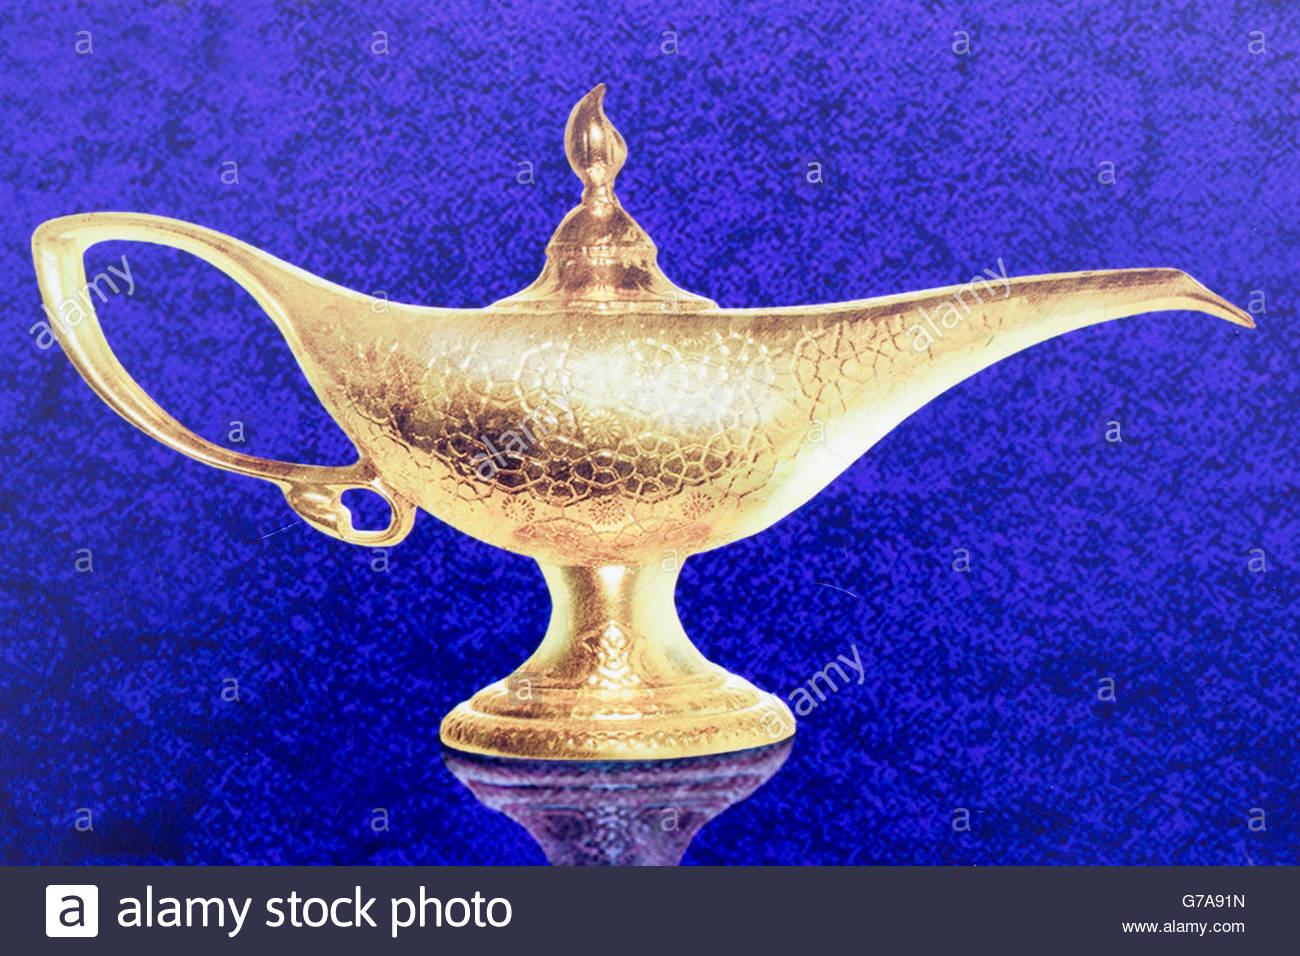 poster for the Disney movie Aladdin's lamp Stock Photo